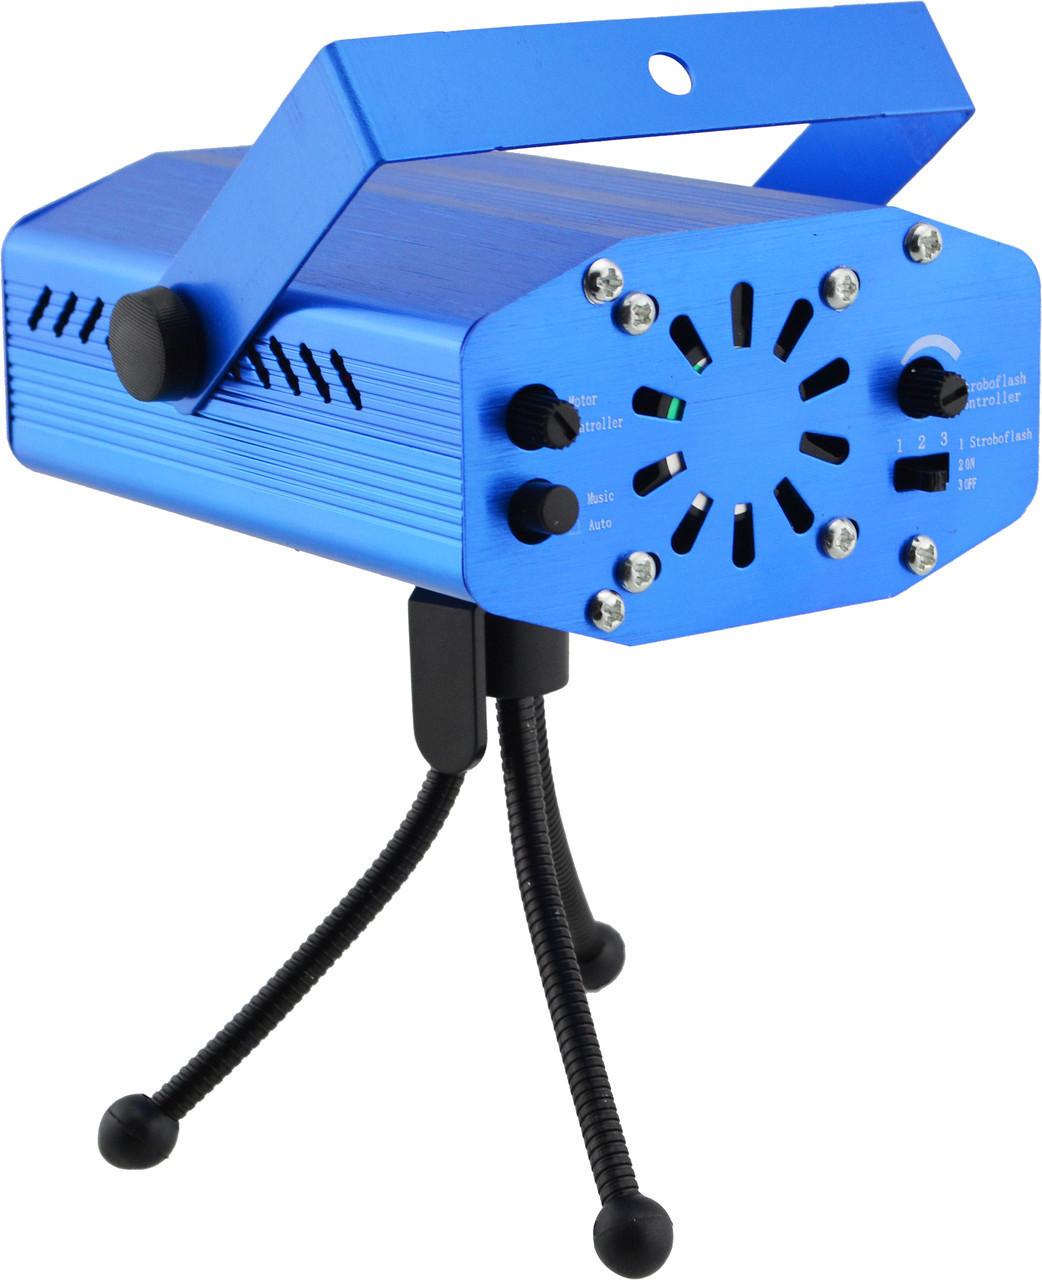 Лазерный проектор Mini Laser Stage Lighting, стробоскоп, лазер шоу